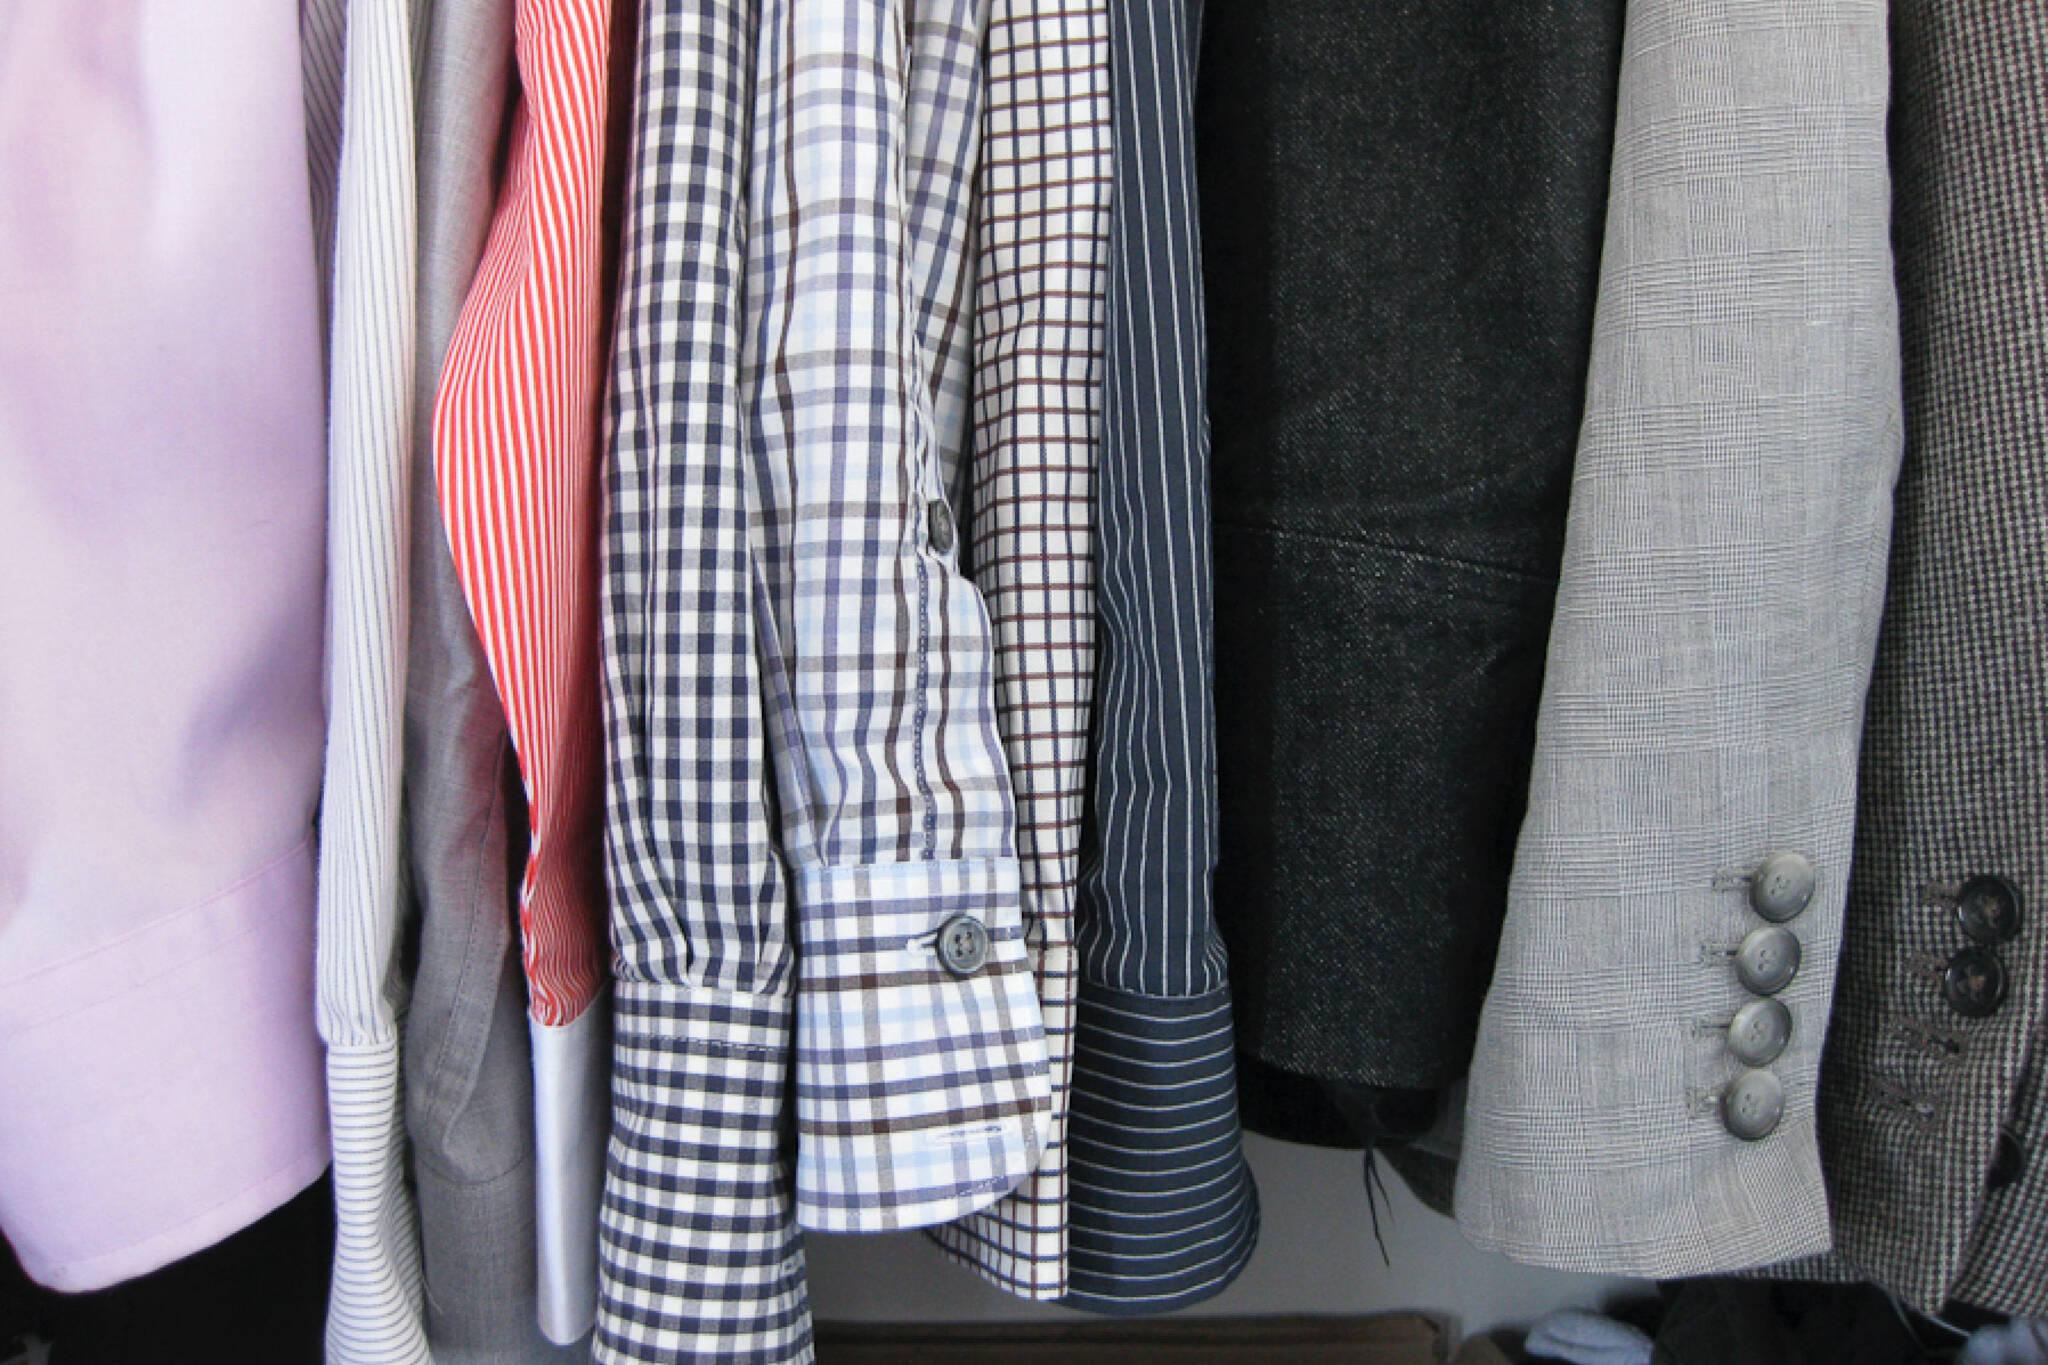 second closet